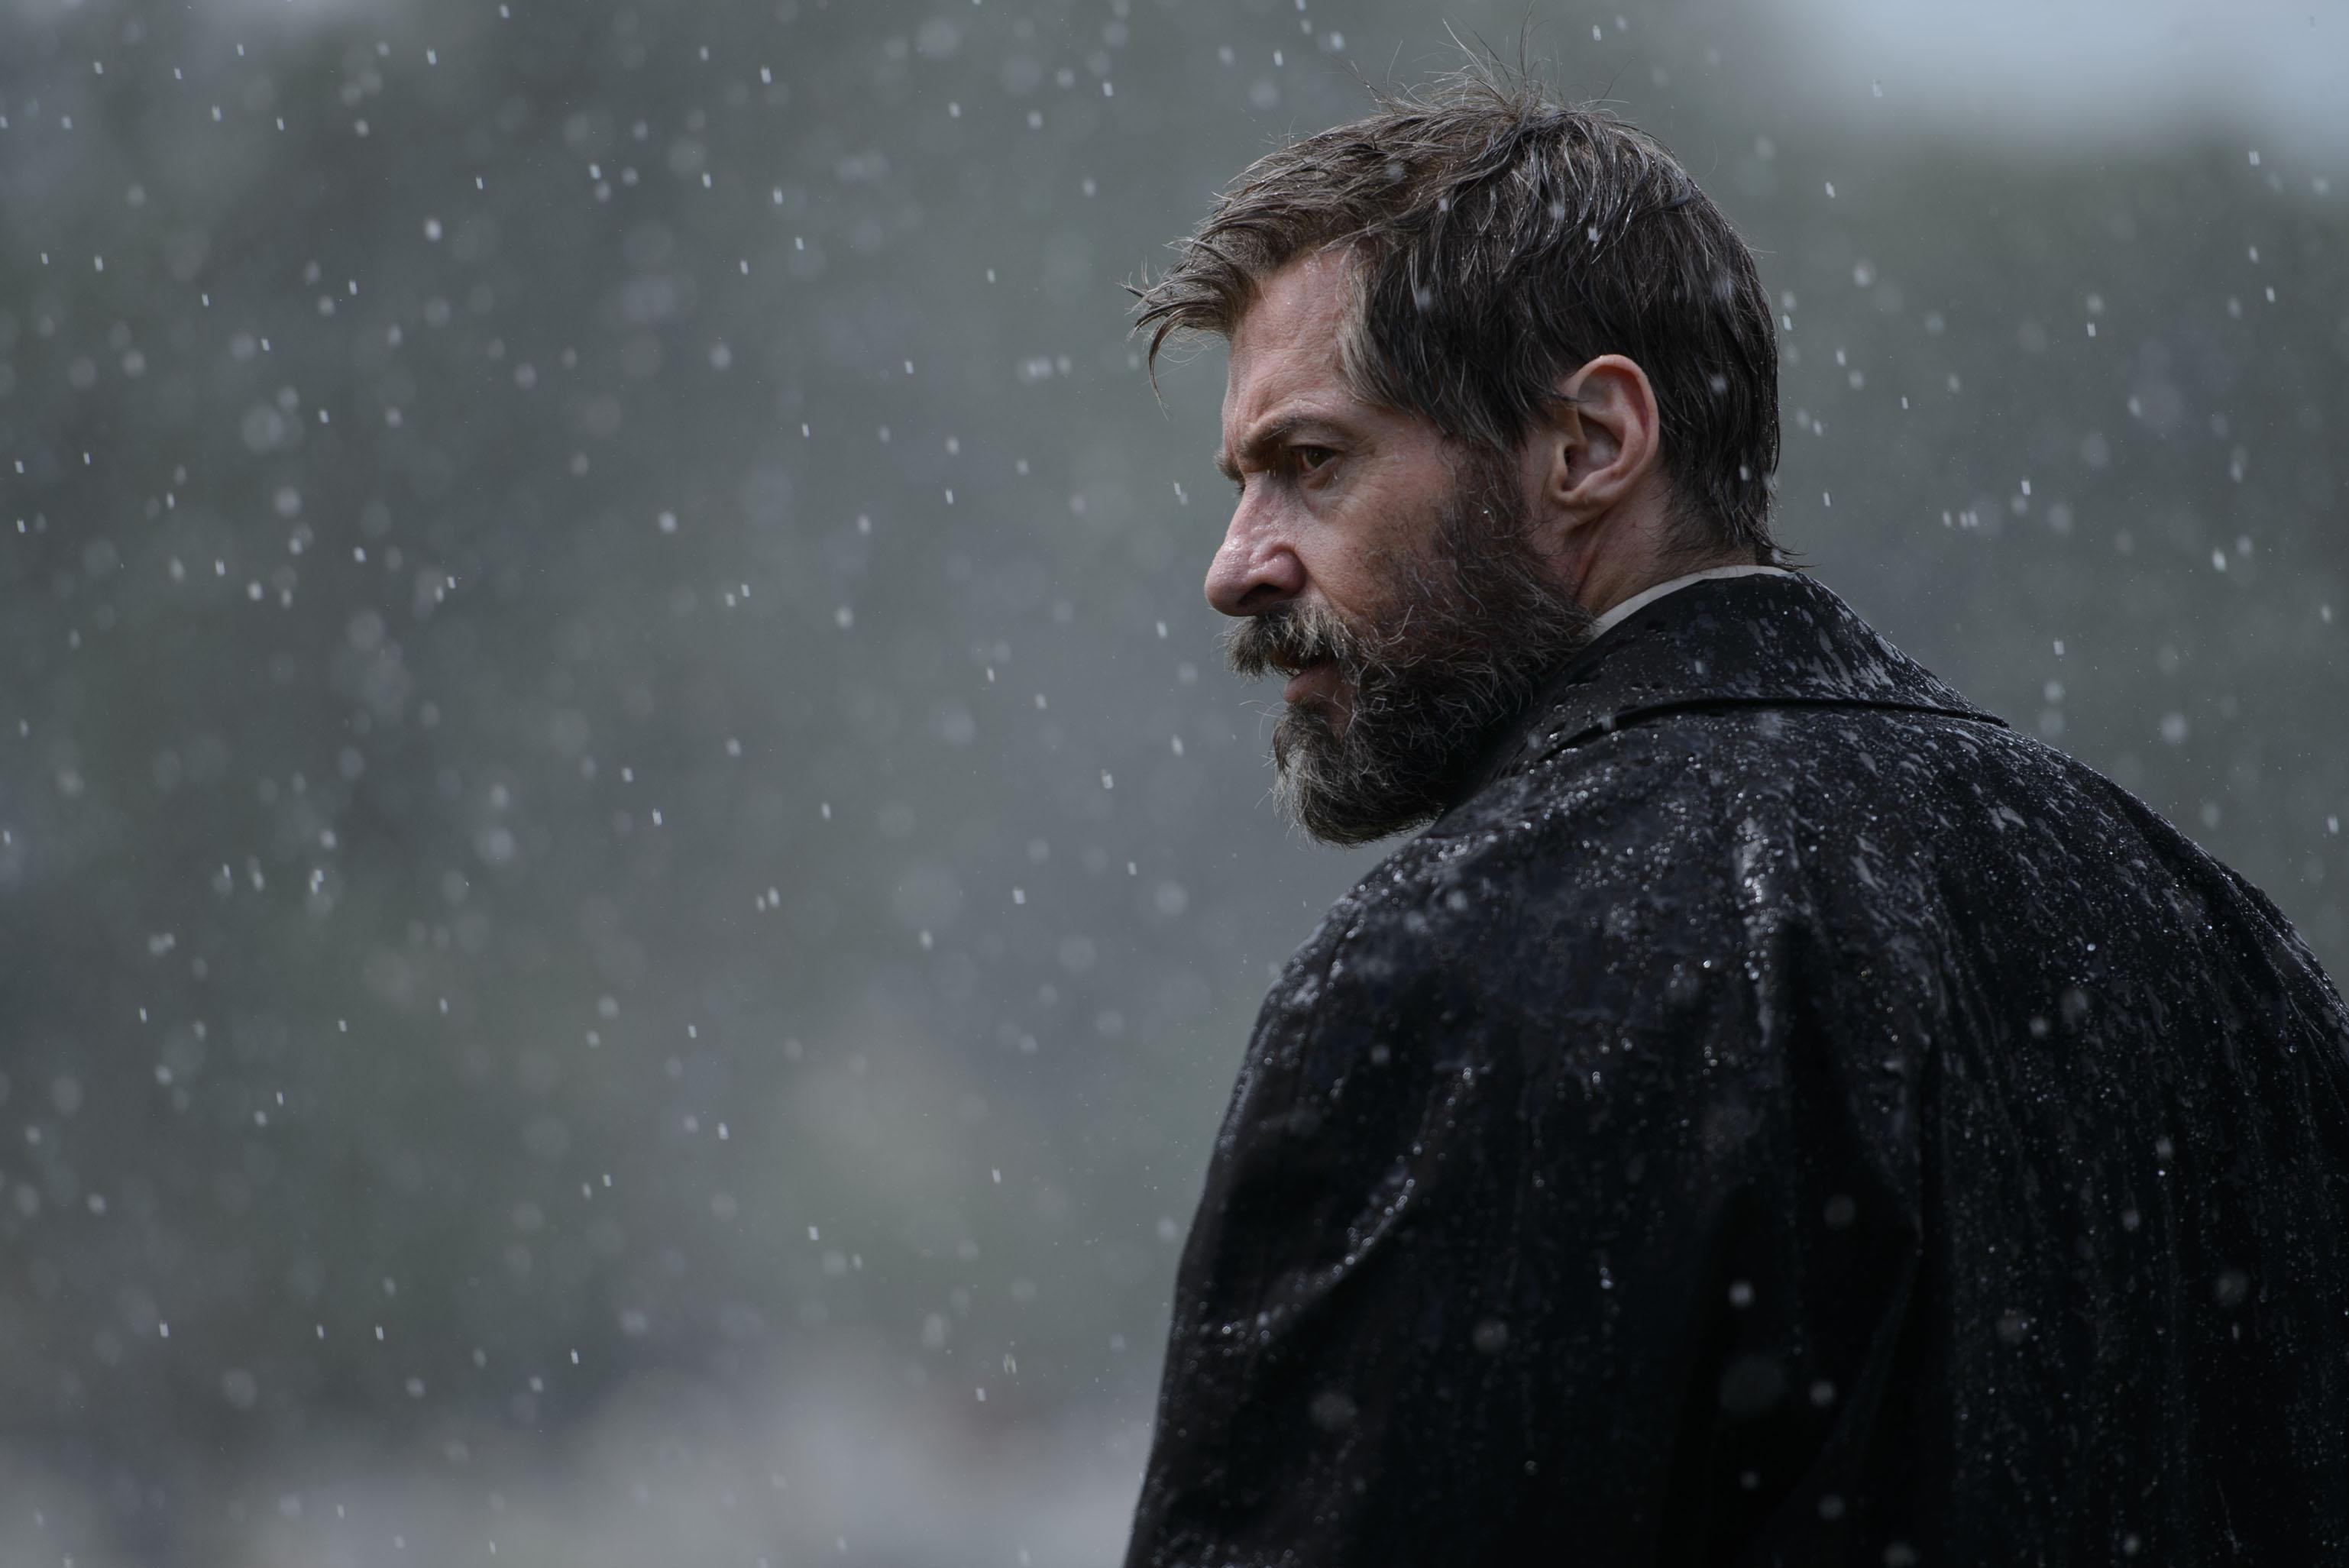 Hugh Jackman stars as Logan